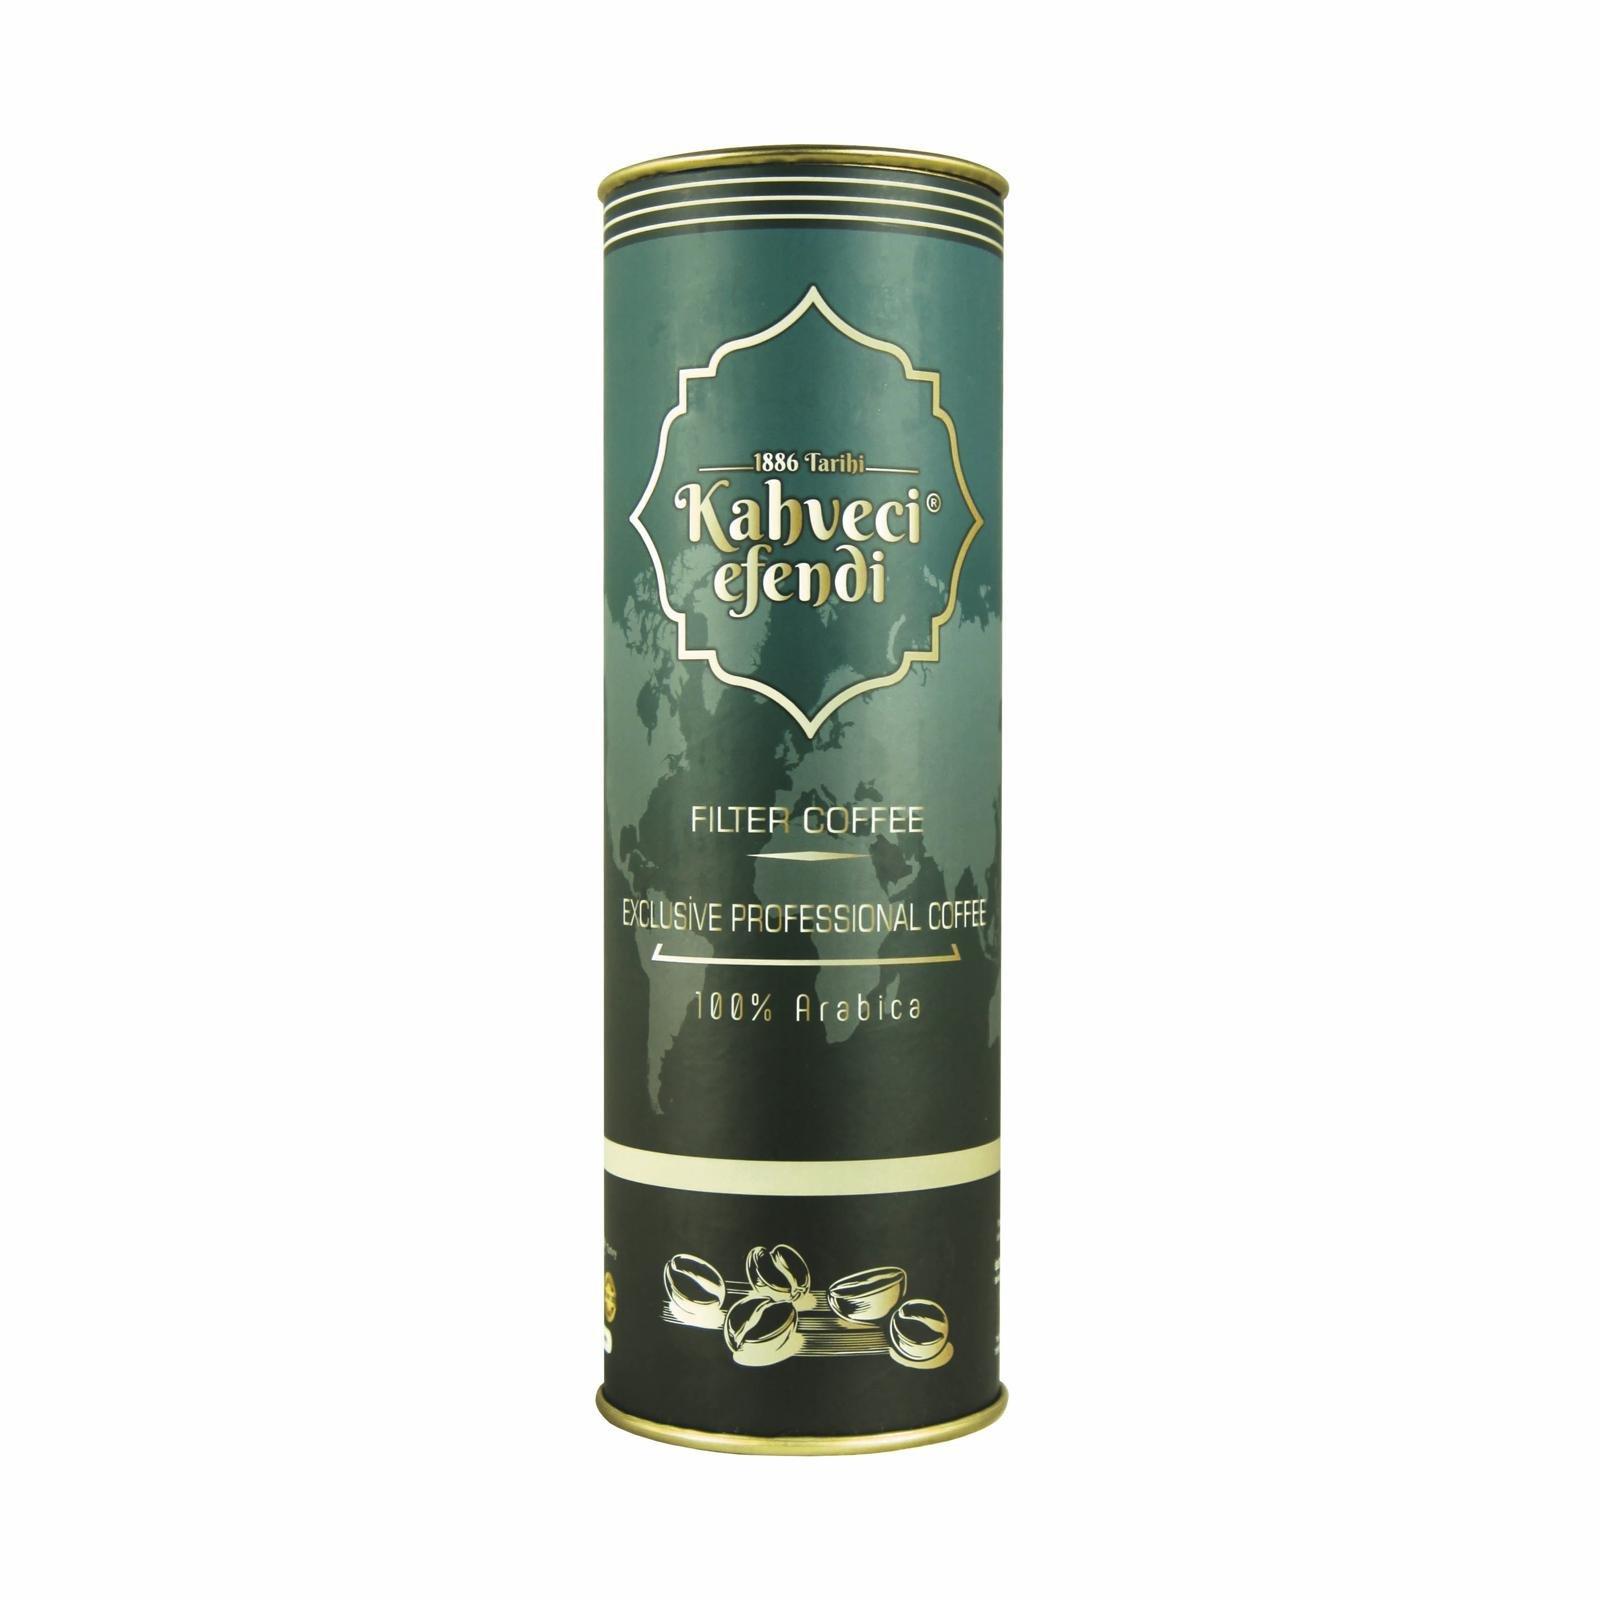 250 GR Exclusive Professıonal Filtre Kahve Premium Teneke Kutu